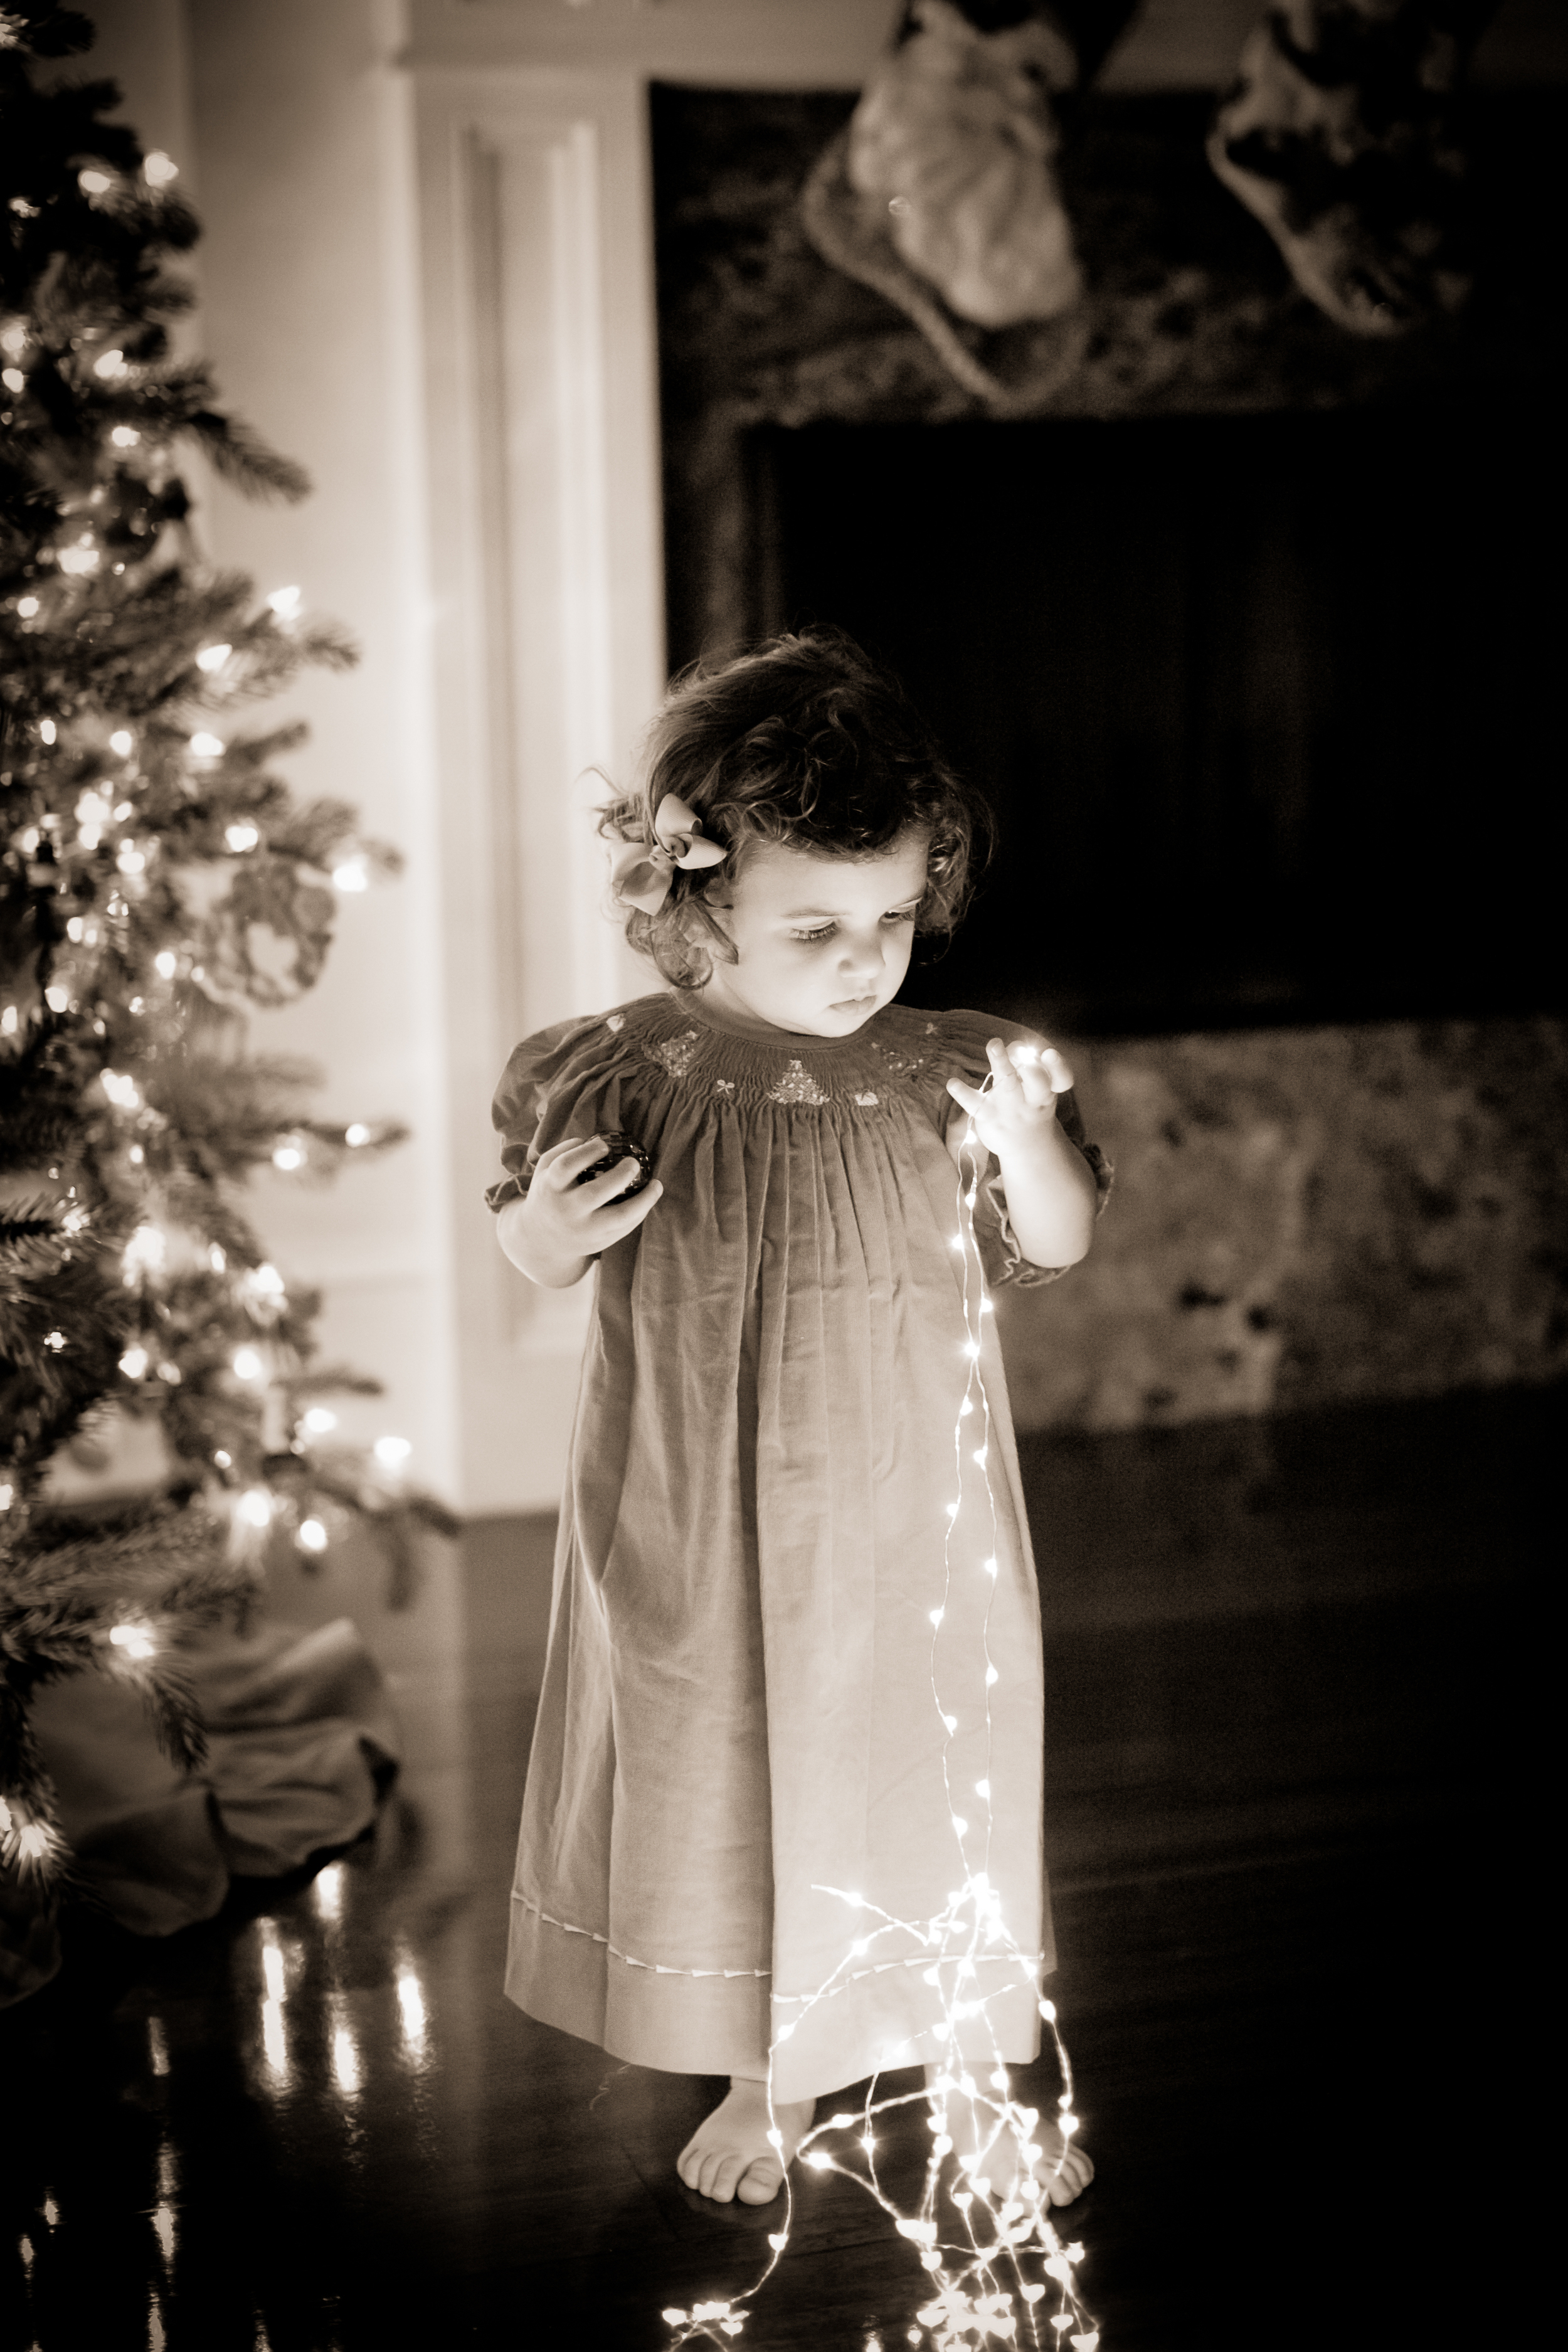 cjnphotos_innocence_children_christmas.jpg